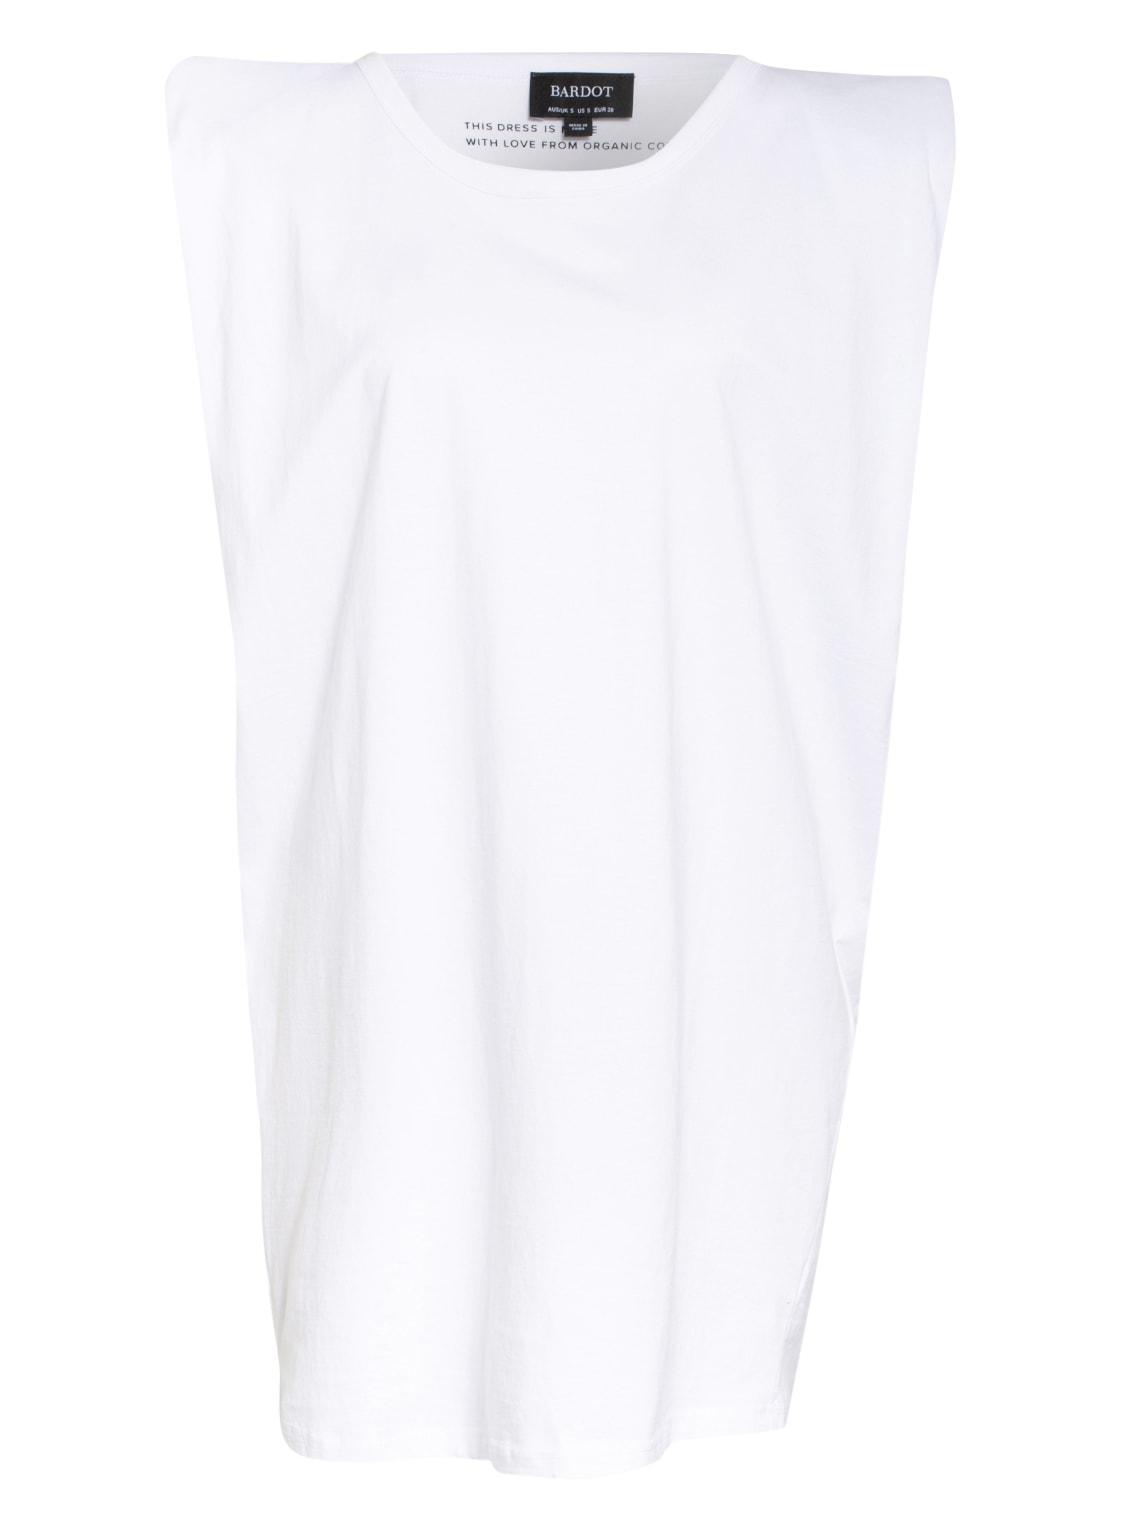 Image of Bardot Jerseykleid weiss